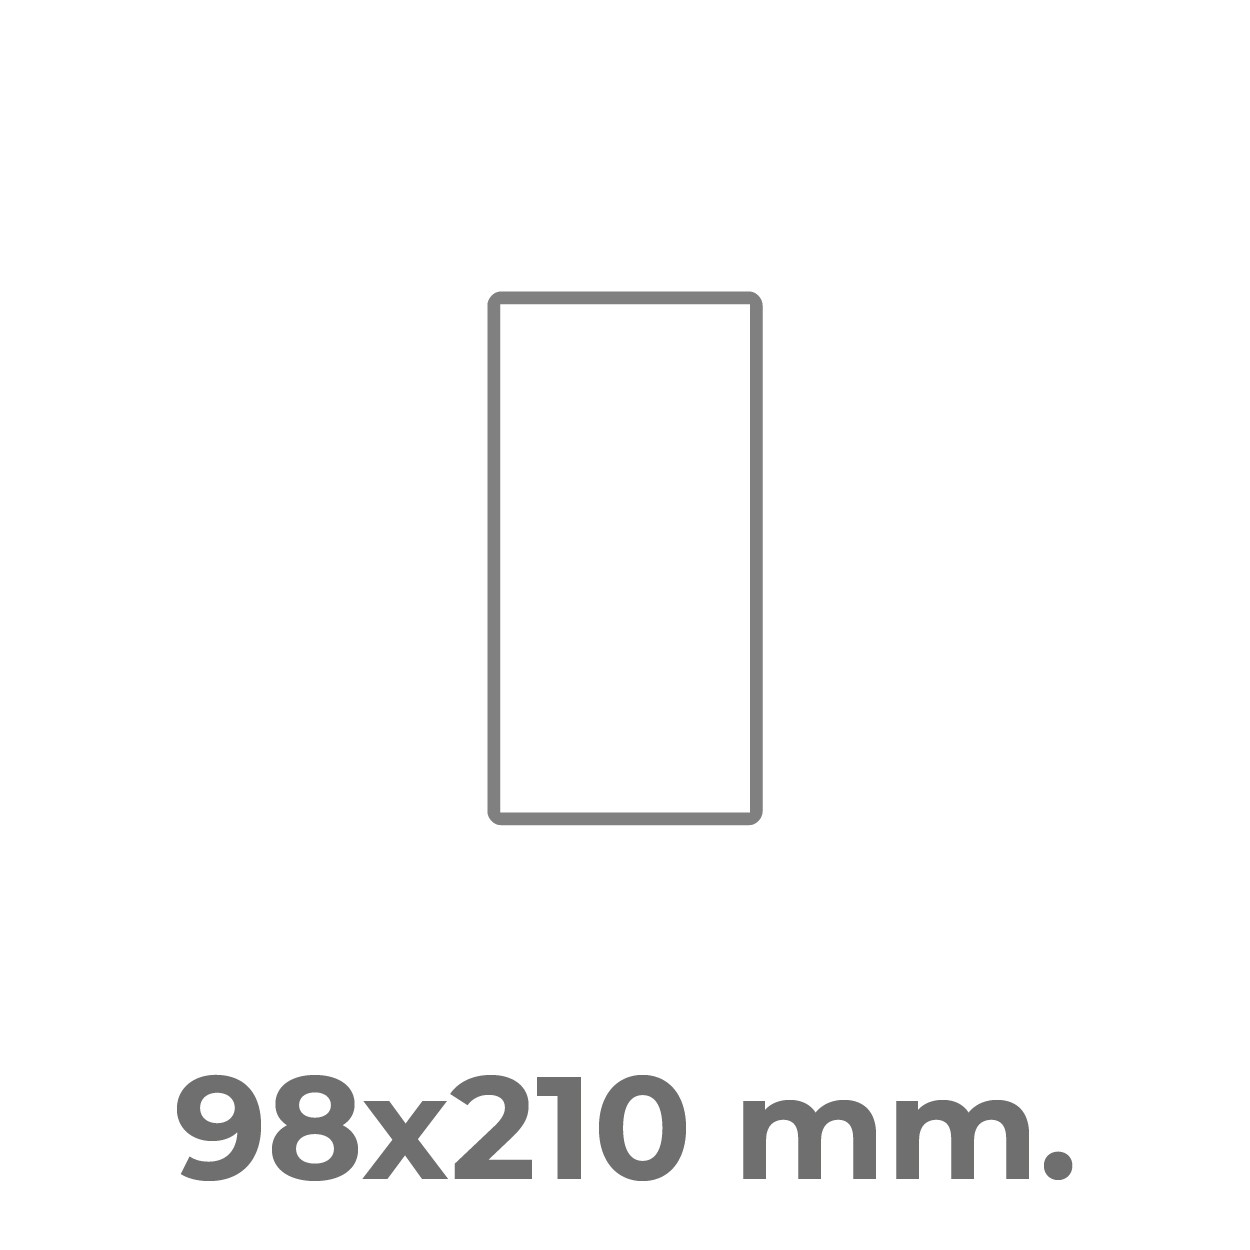 98x210 mm.